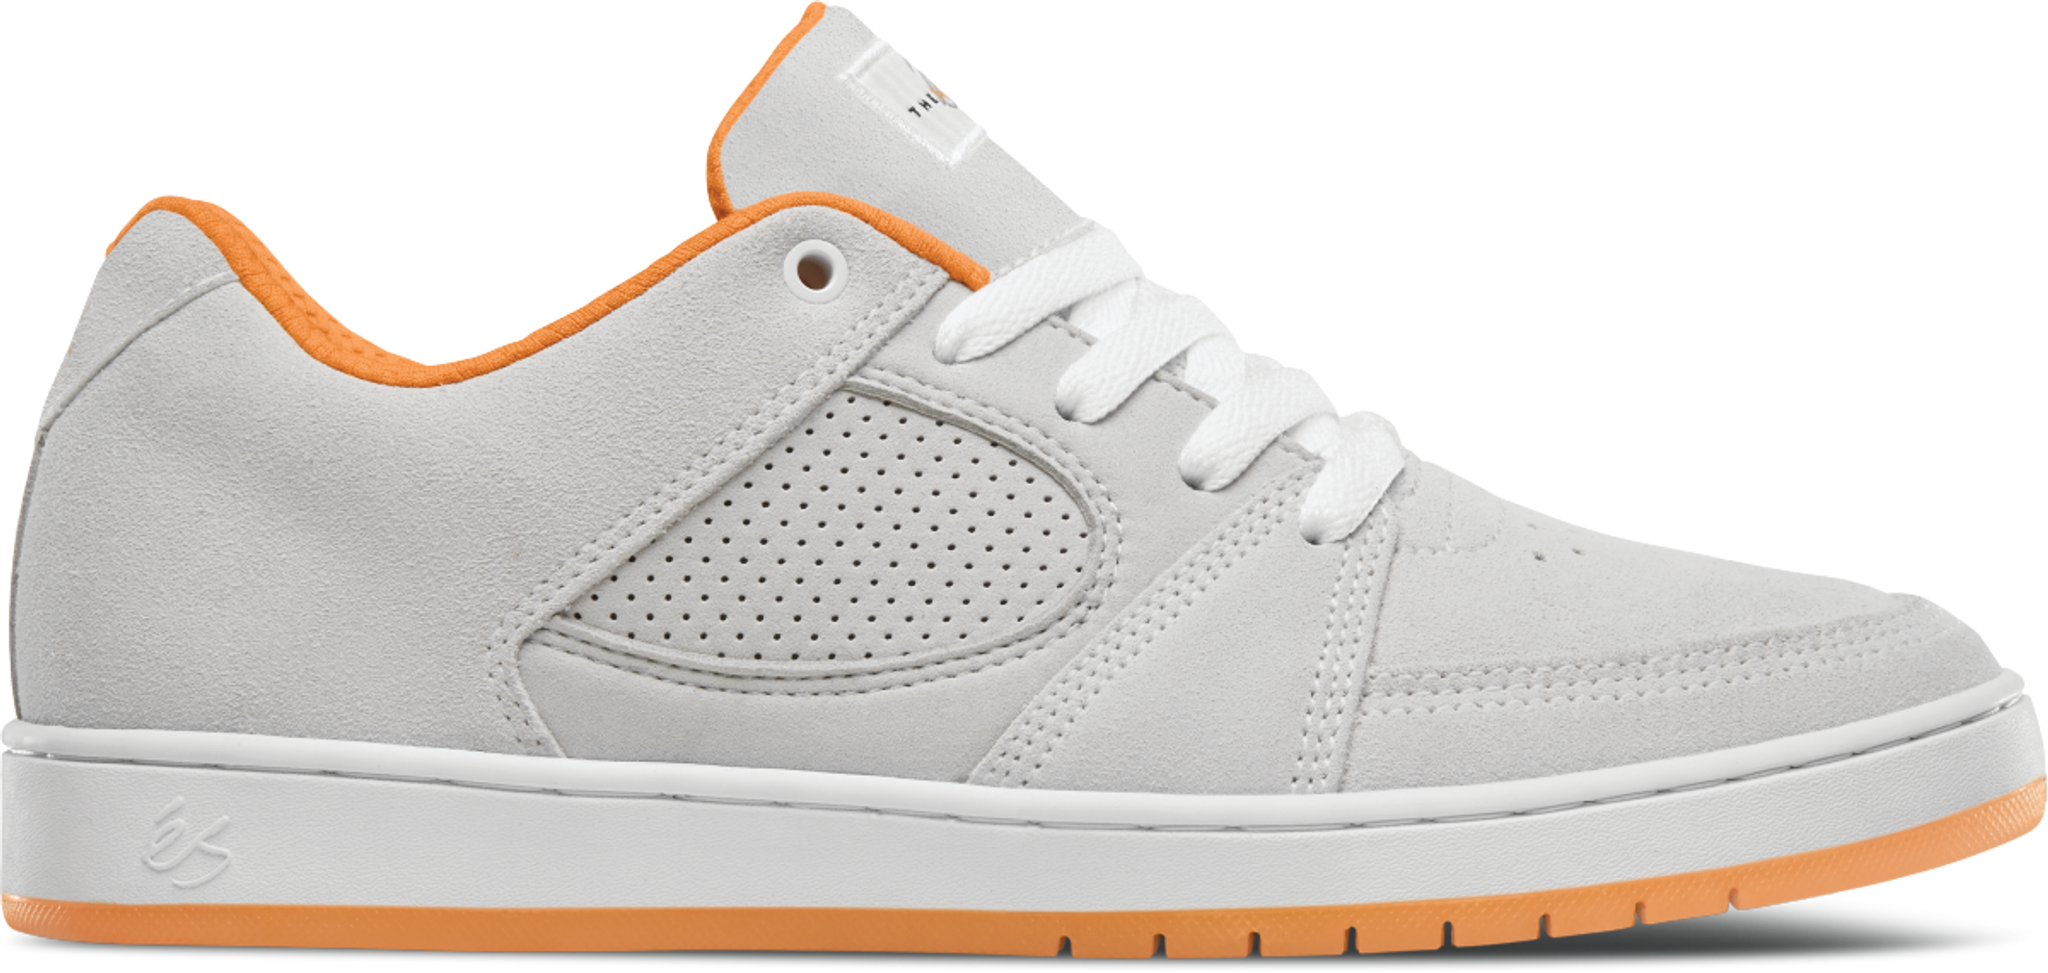 3972d2640f eS Accel Slim Nine Club Shoes White FREE USA SHIPPING Skate Sneakers